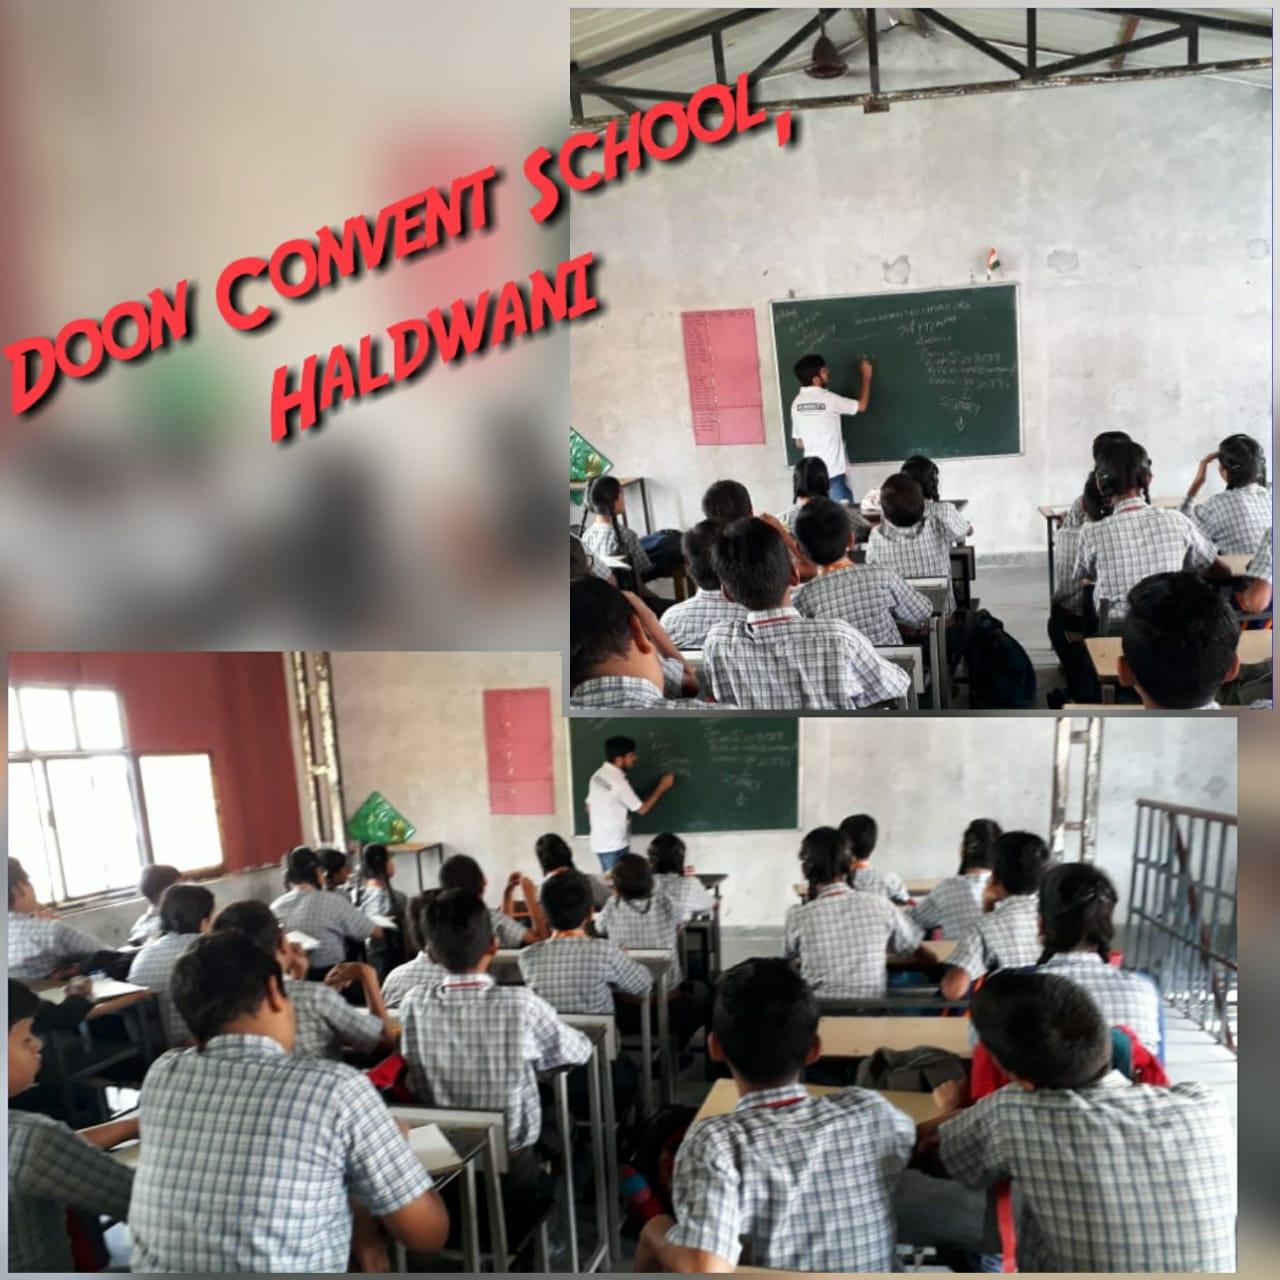 Doon convent School Haldwani.jpeg